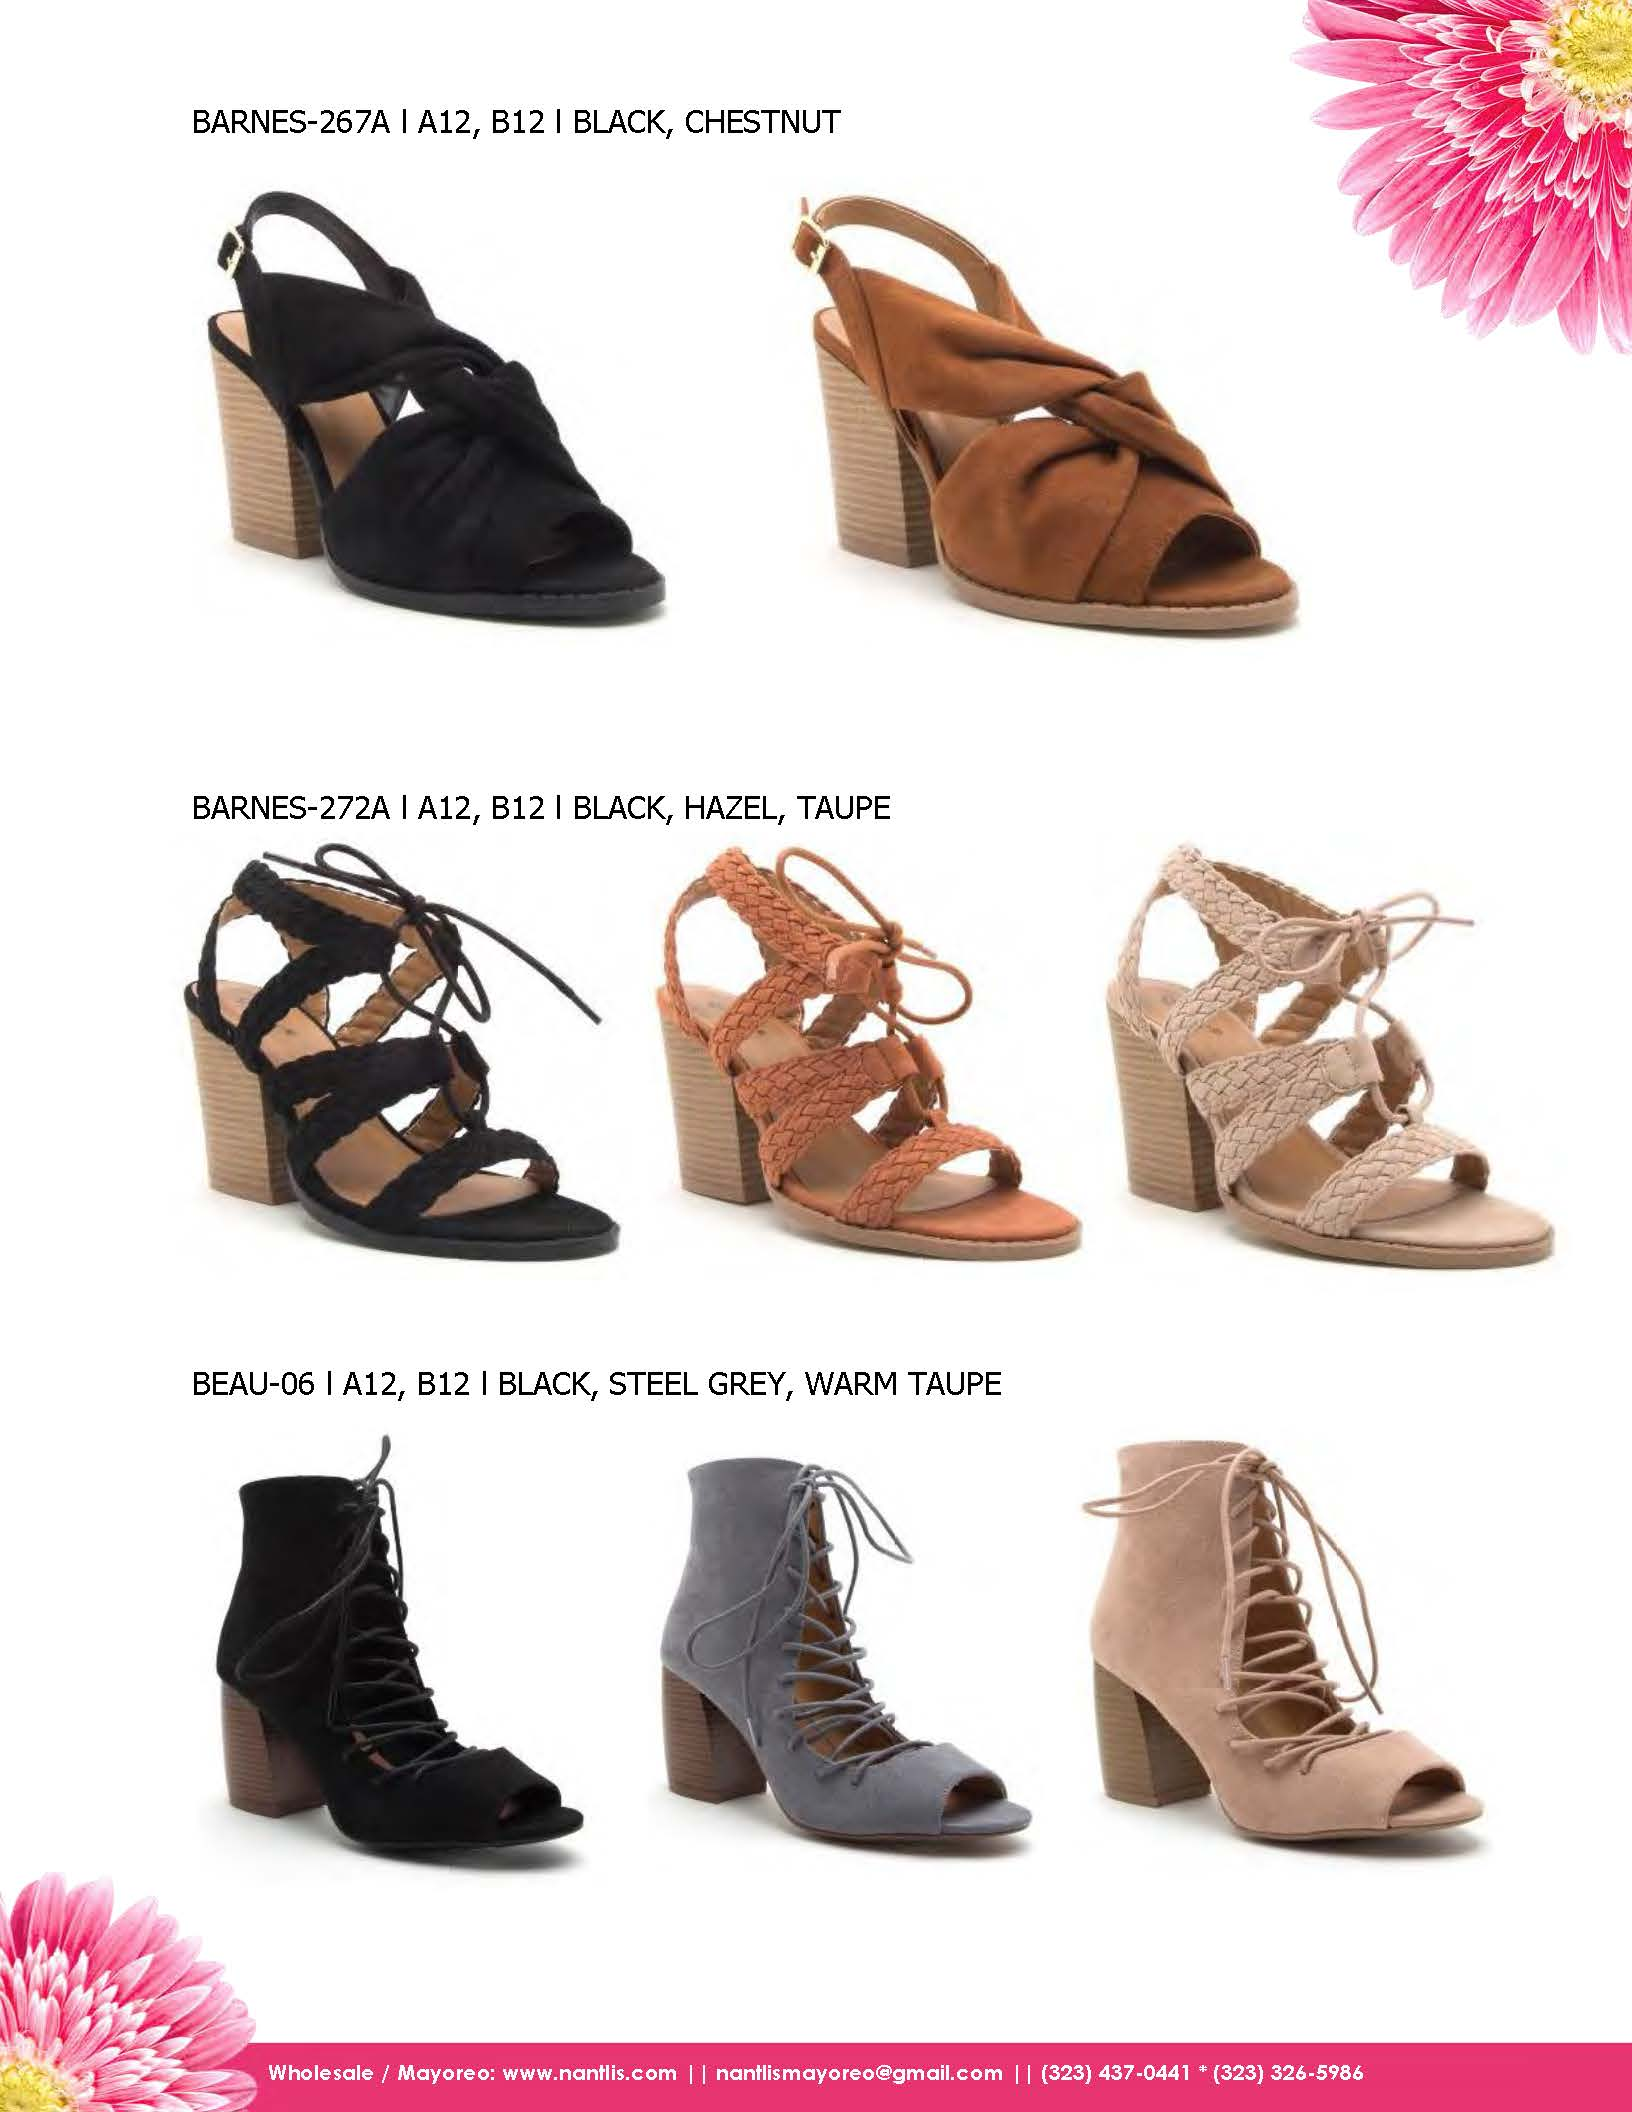 Nantlis Vol QU43 Zapatos para mujer mayoreo Wholesale shoes for women_Page_04